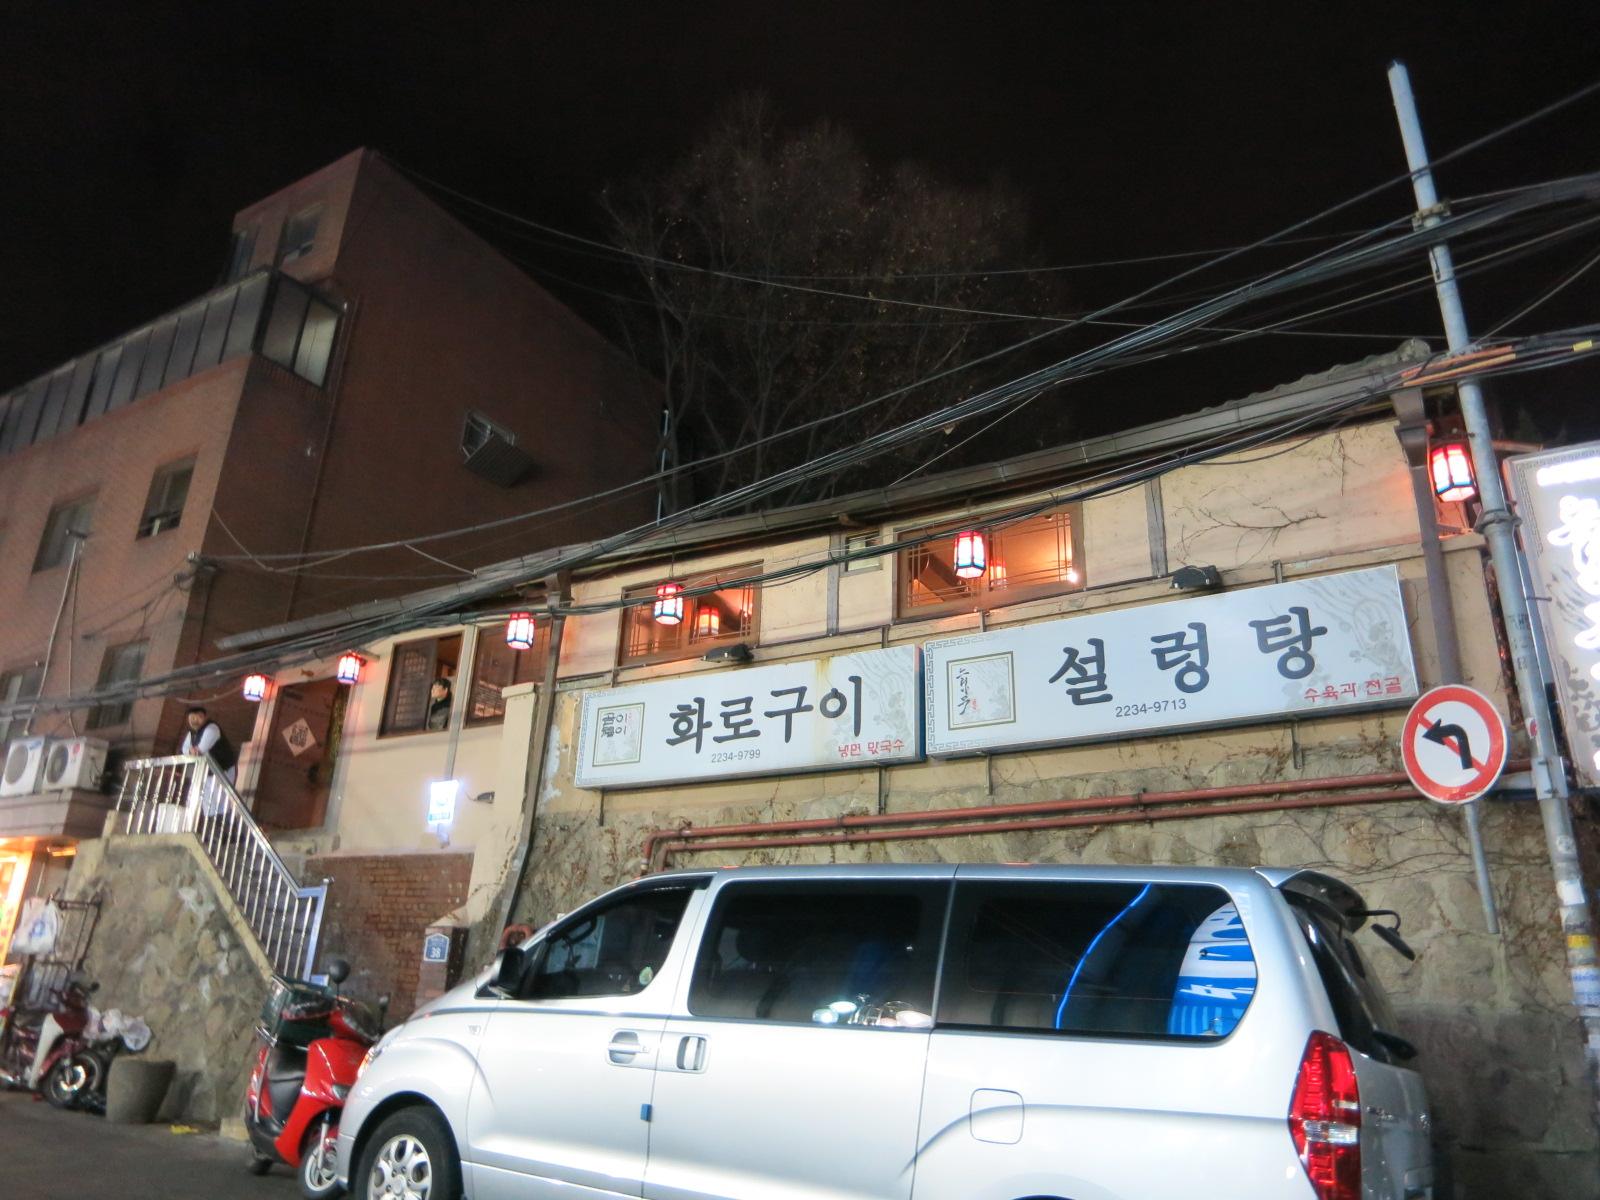 X'mas in Seoul ④真夜中のヌティナム(チッ)_f0236260_046442.jpg